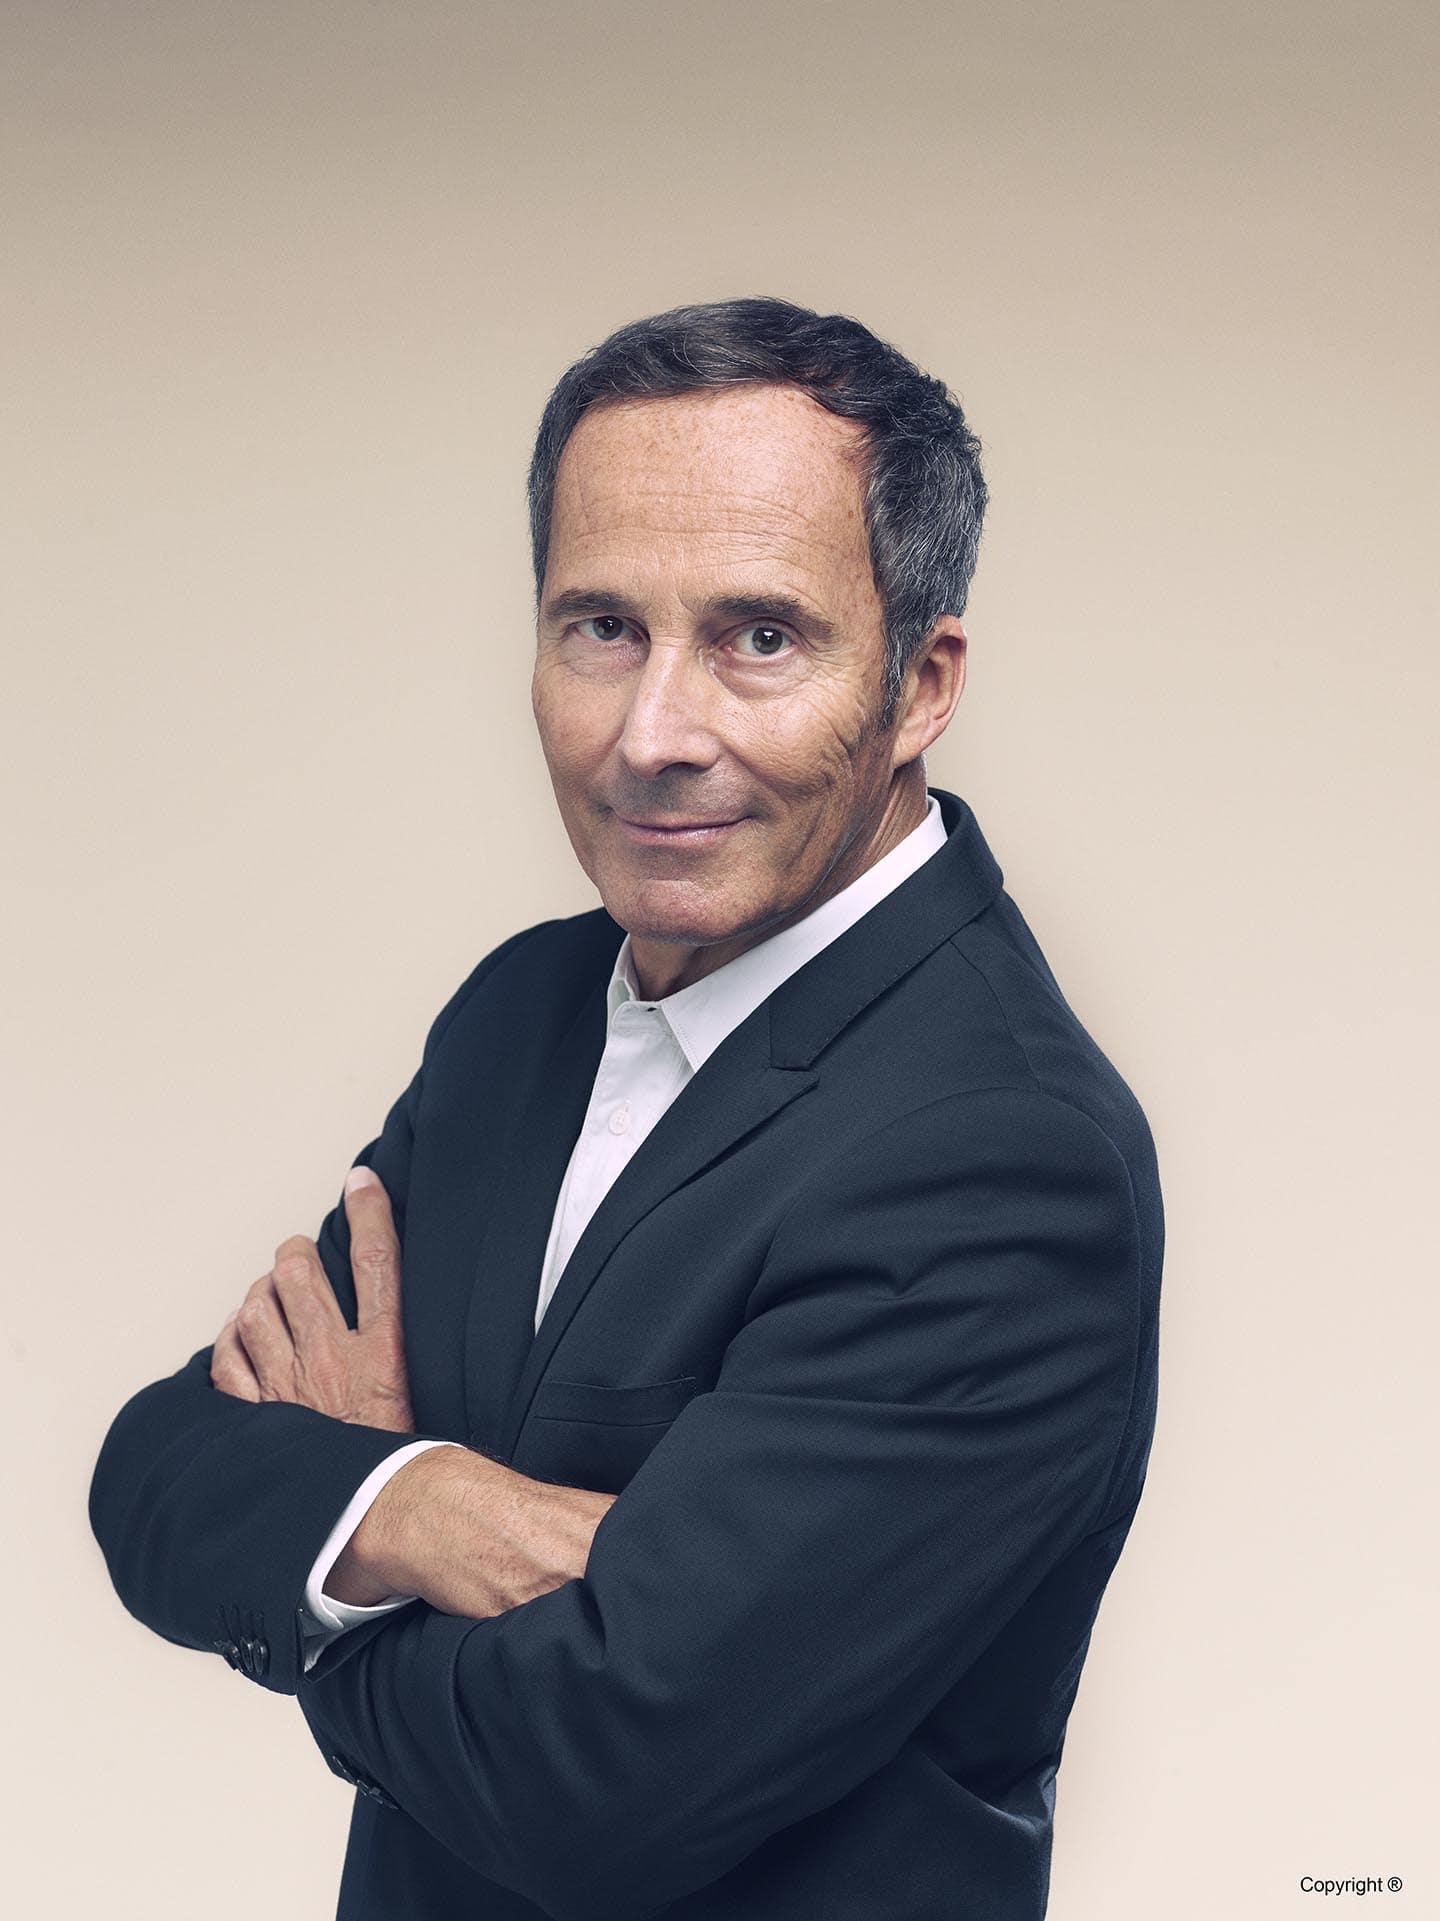 Maître Parfumeur Olivier Cresp